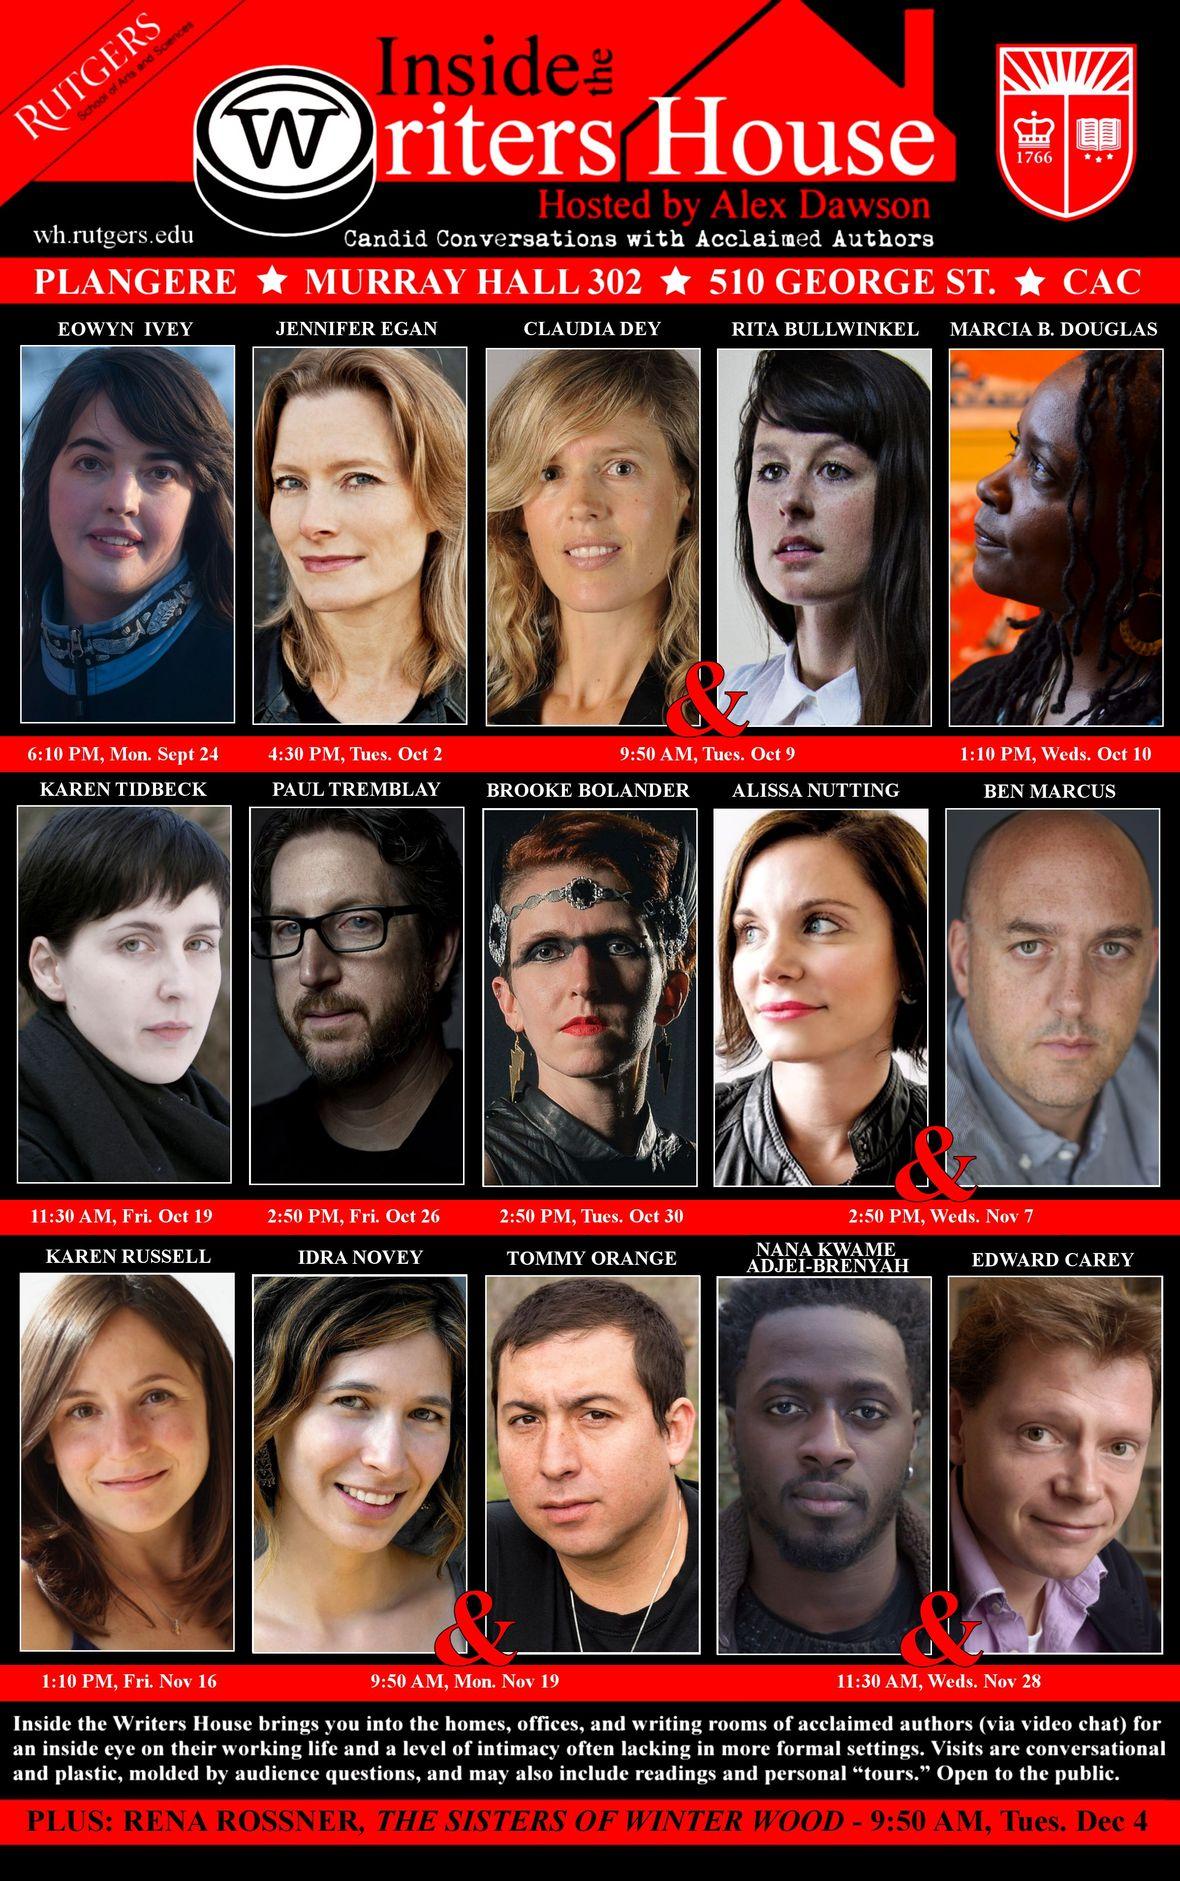 FINAL FALL 2018 INSIDE THE WRITERS HOUSE - Alex Dawson